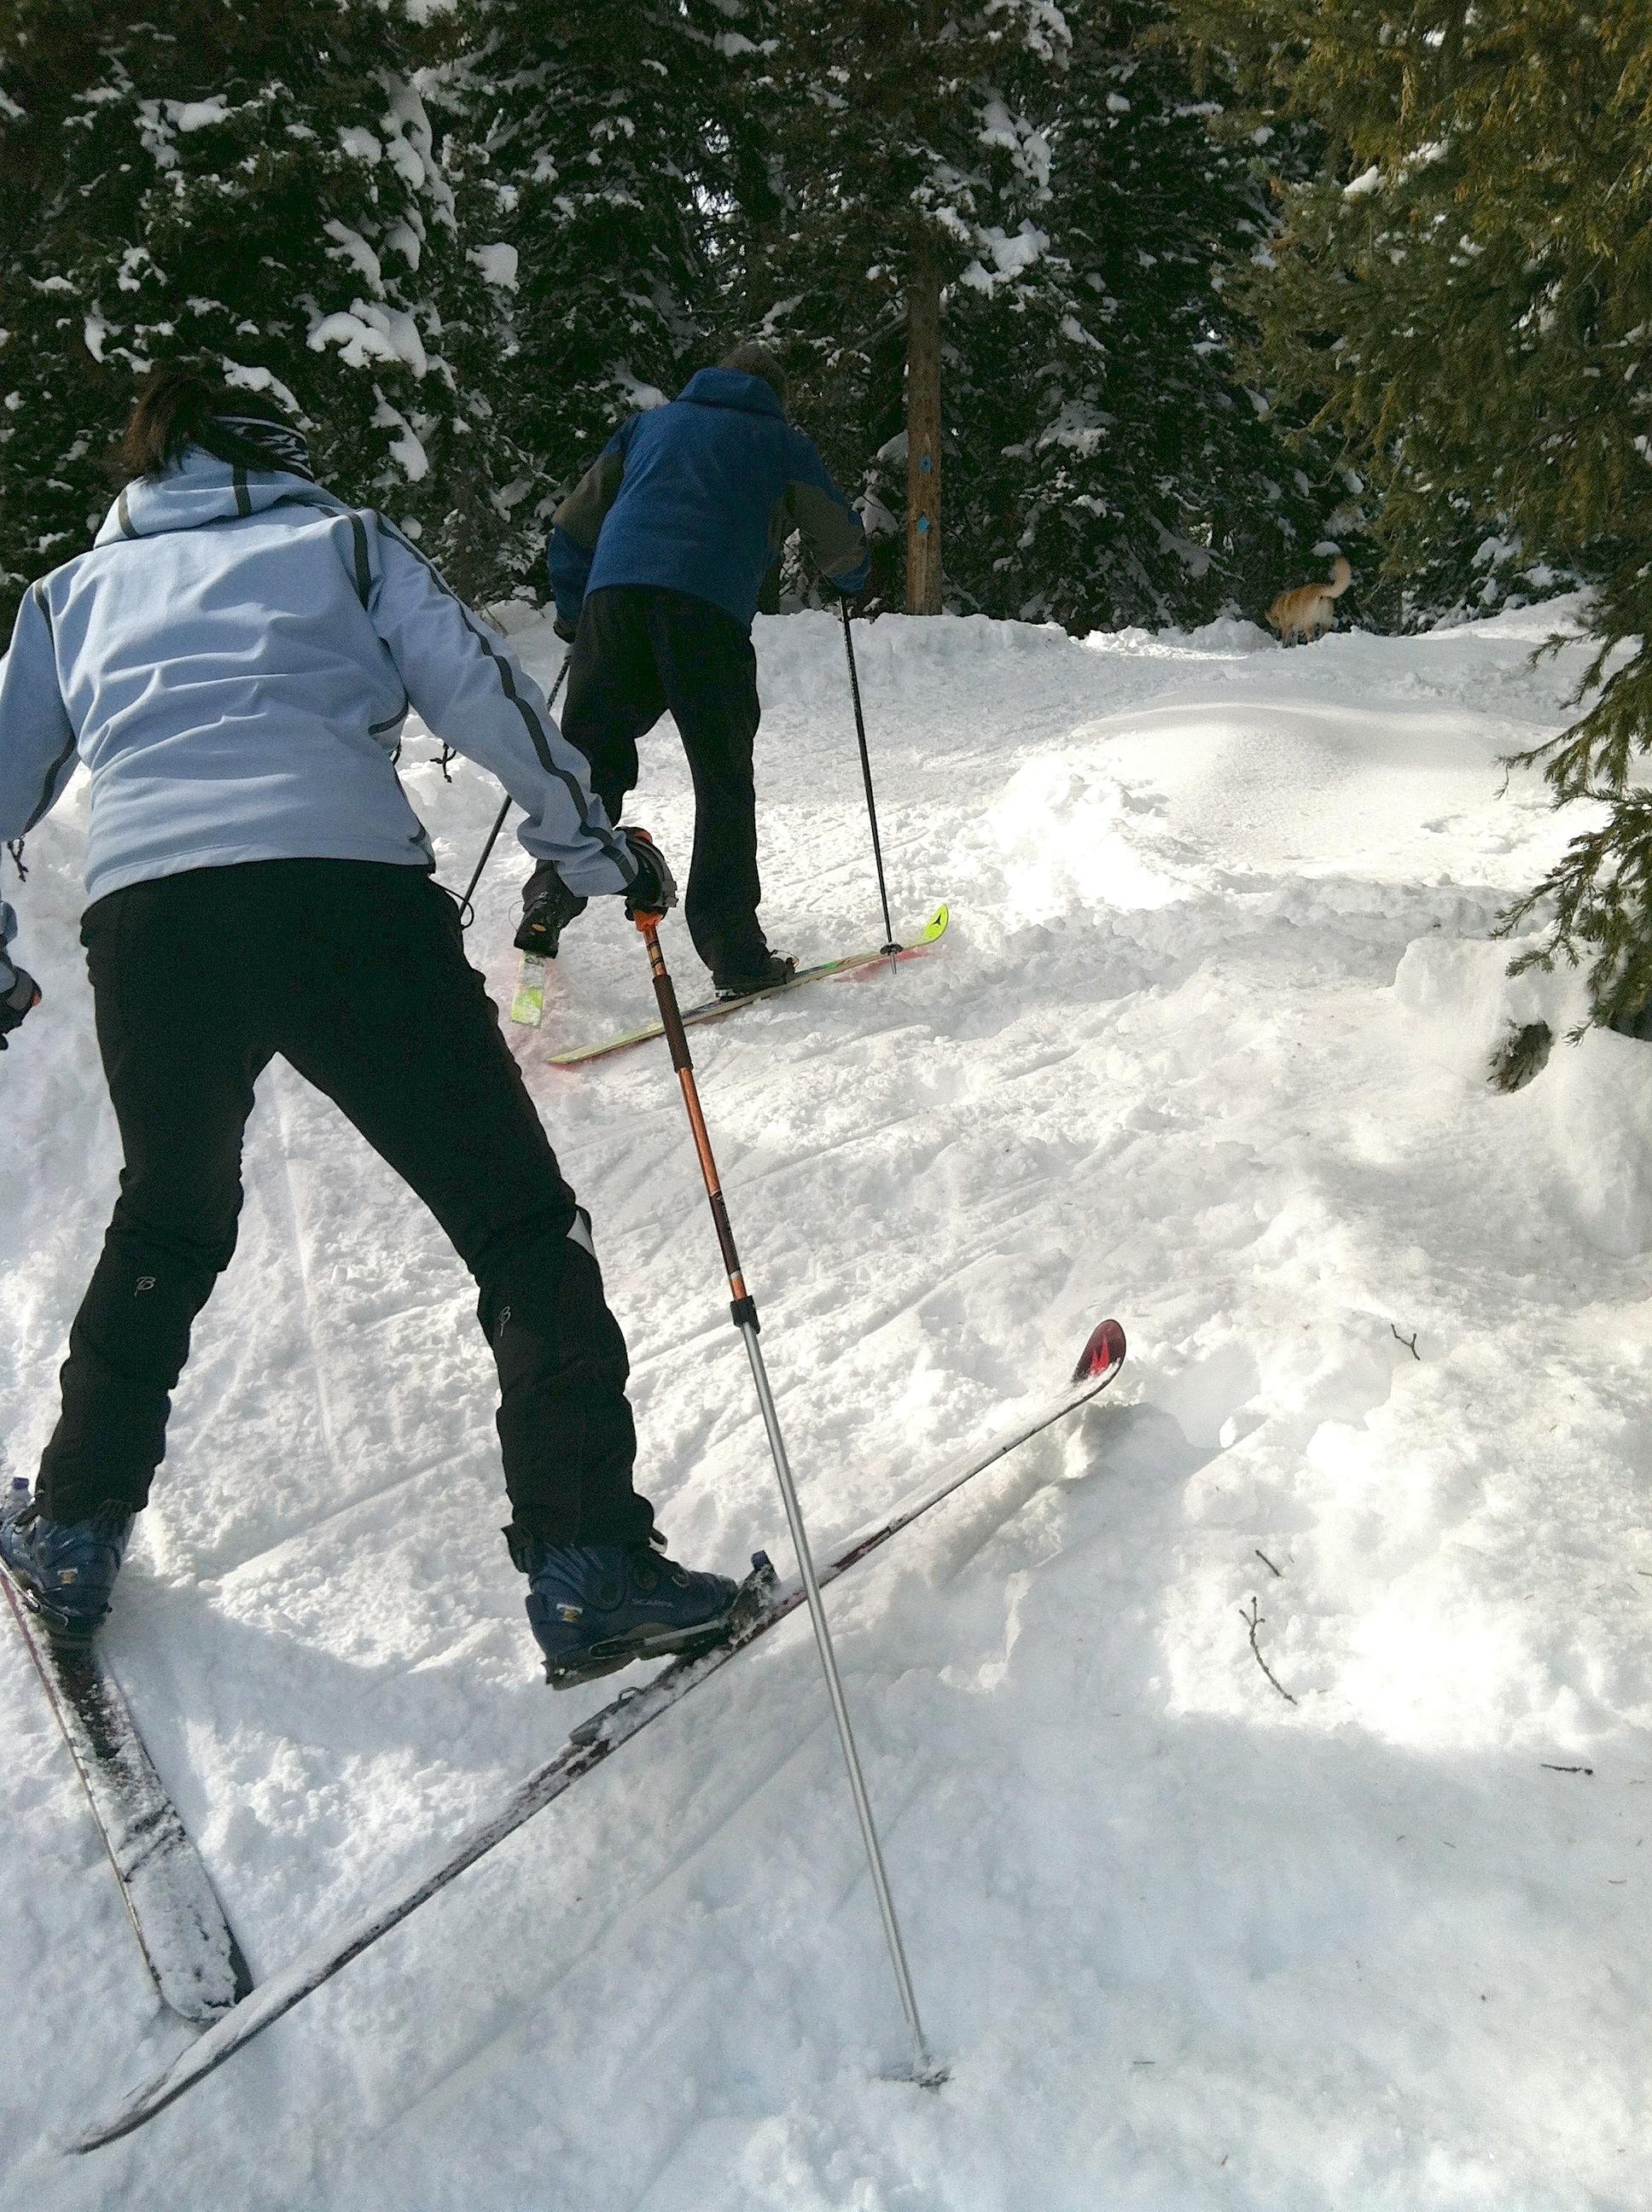 Cross-country skiiers, our sworn enemy